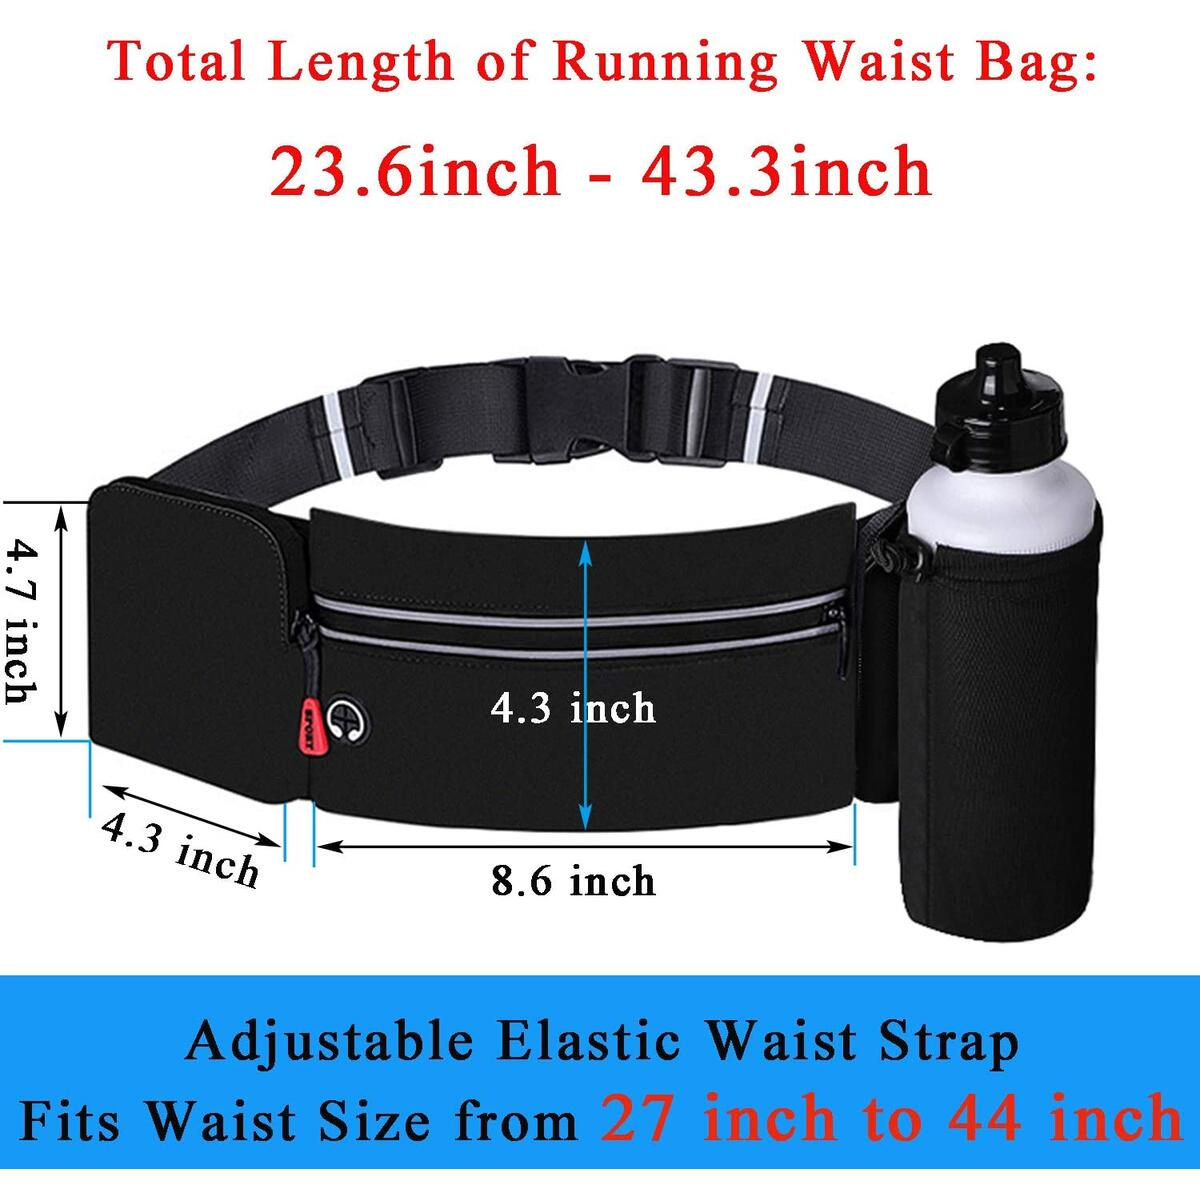 Wesoke Running Belt Bag Fanny Pack, Adjustable Waist Strap Water Resistant Reflective Strip No-Bounce with Foldable Water Bottle Holder(Bottles NOT Included), Phone Holder Fits All Phones (Black)